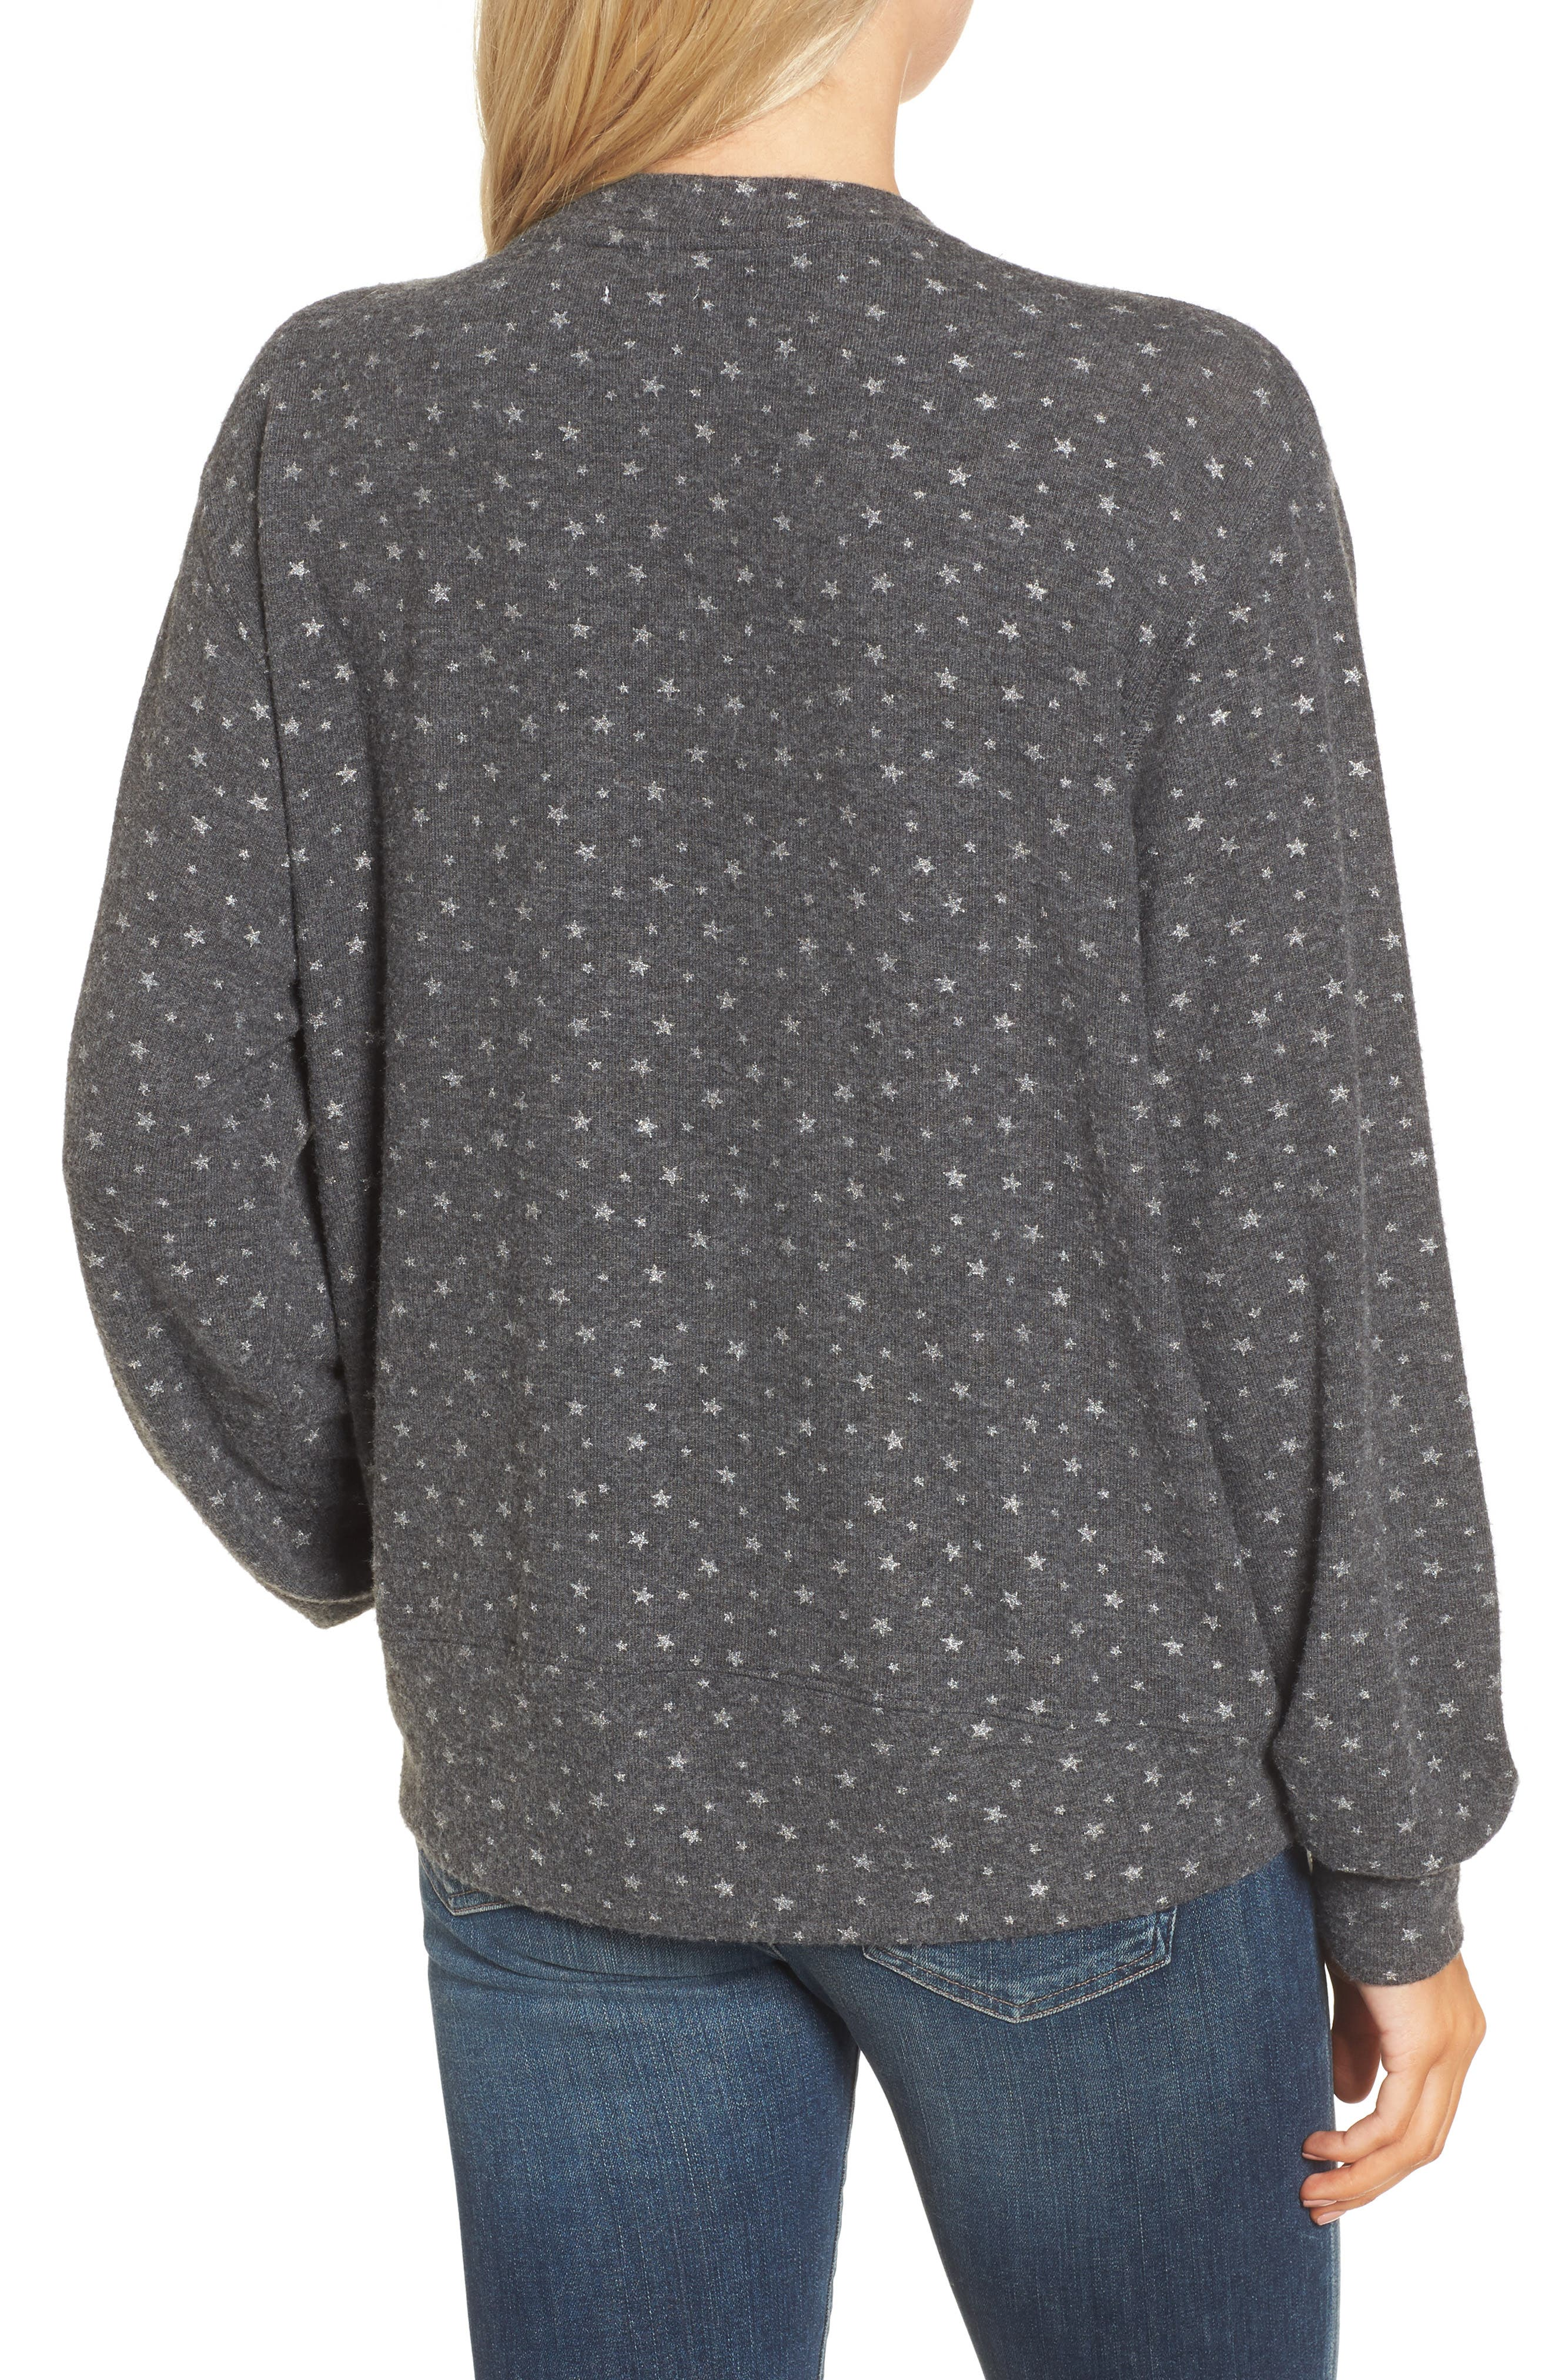 Sparkle Sweatshirt,                             Alternate thumbnail 2, color,                             Charcoal/ Silver